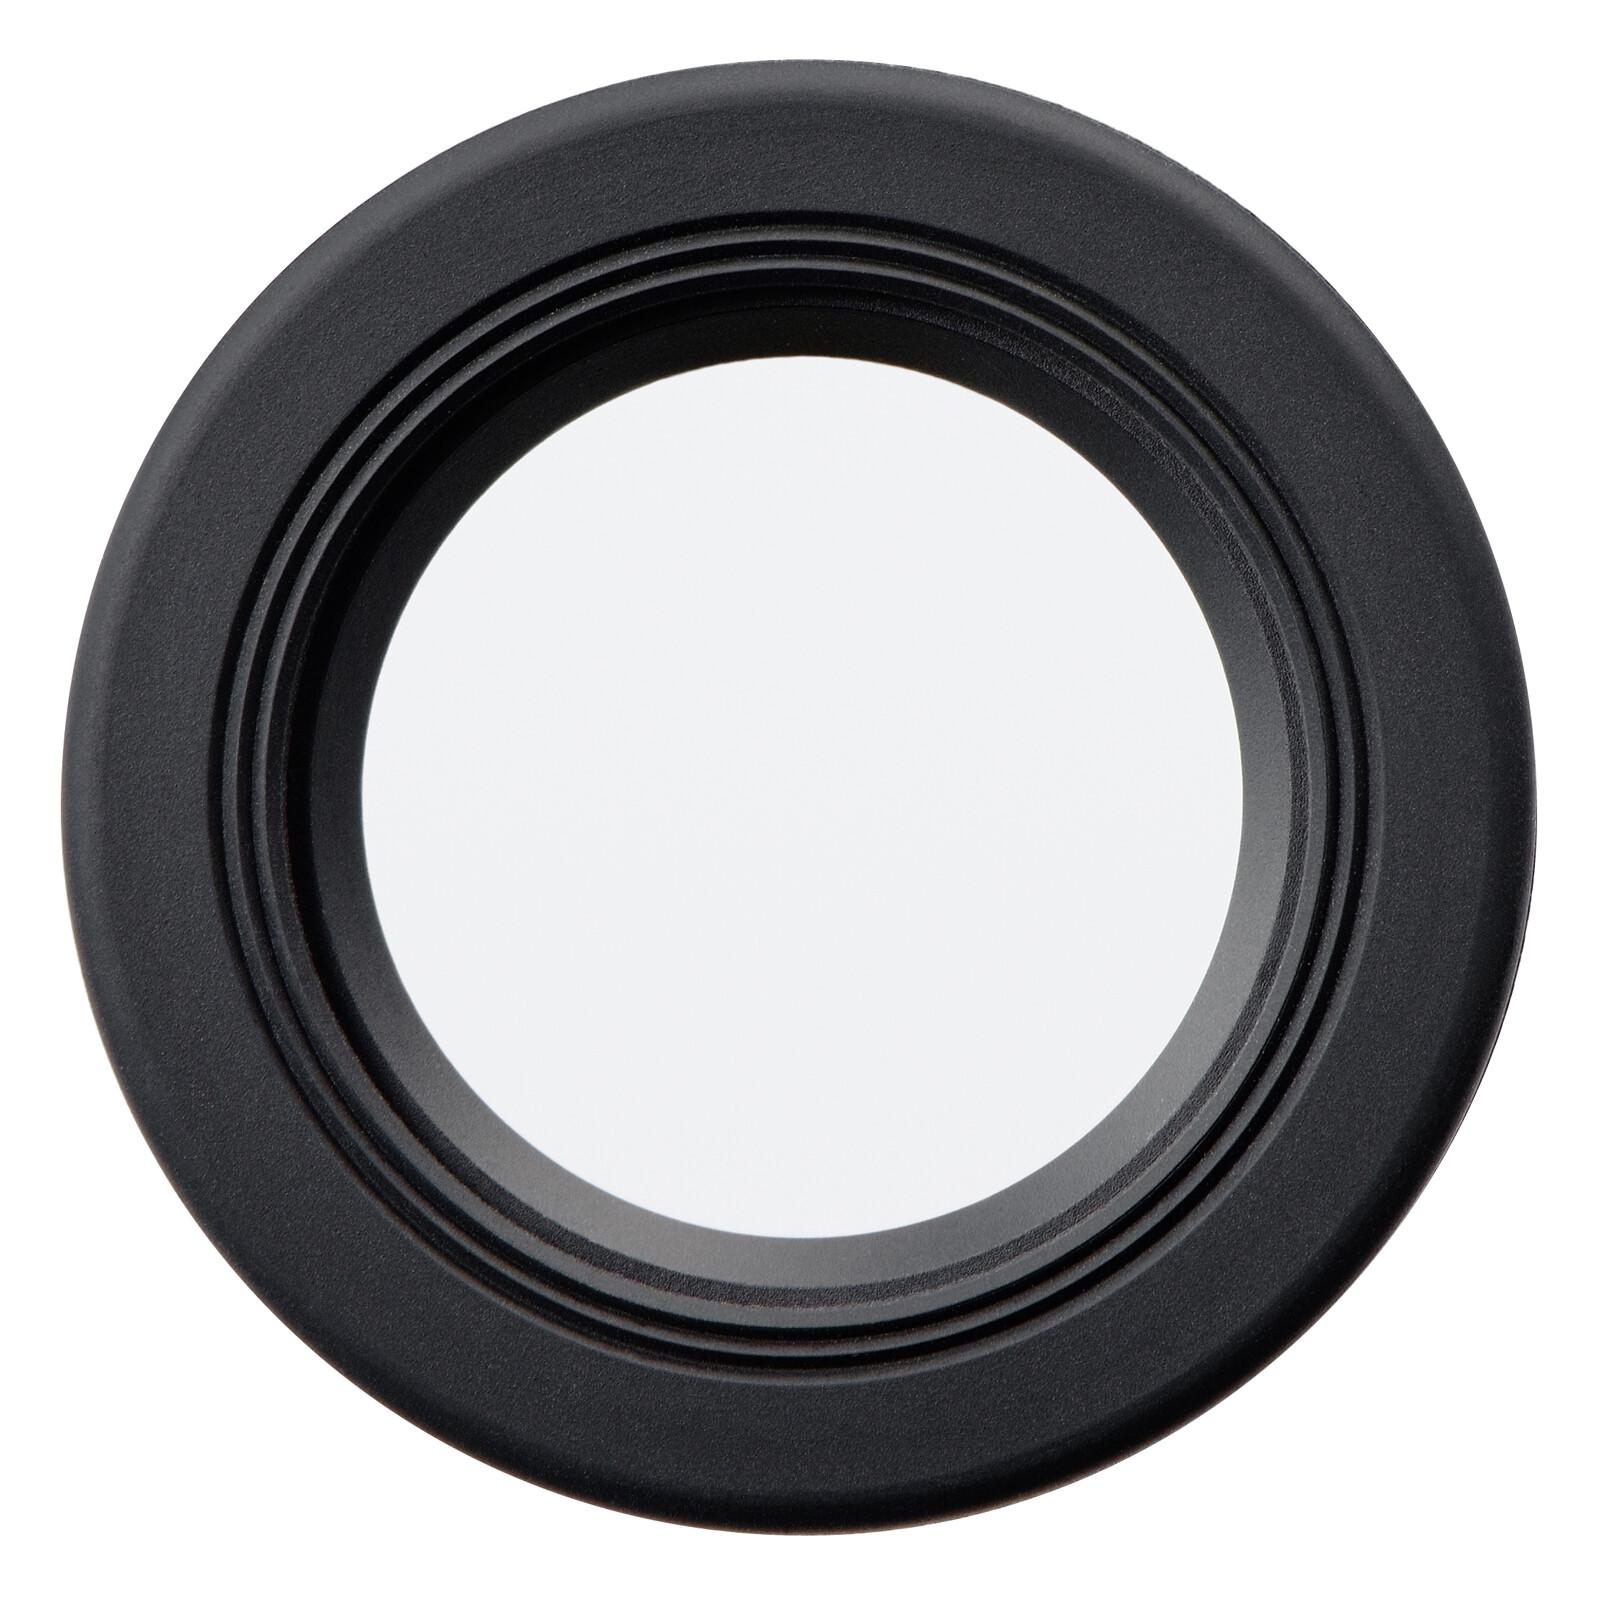 Nikon DK-17F Okkularschutzglas